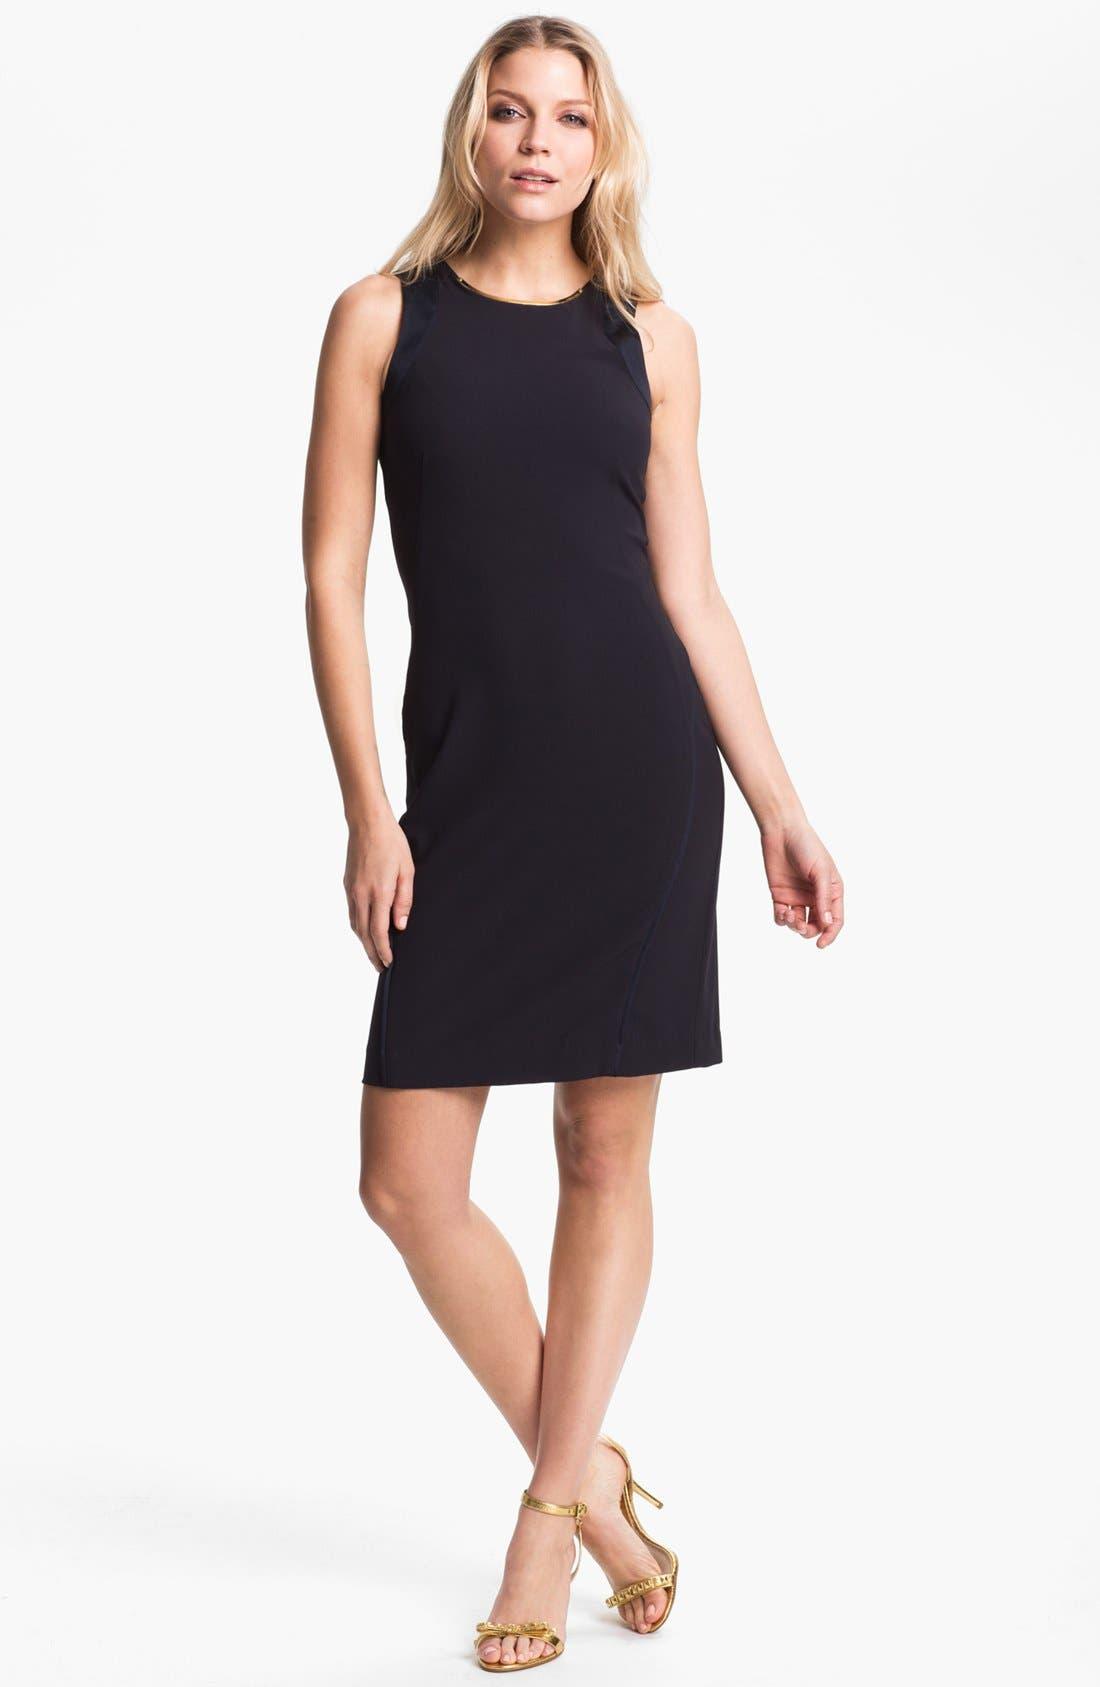 Alternate Image 1 Selected - MICHAEL Michael Kors Embellished Neck Sleeveless Dress (Petite)